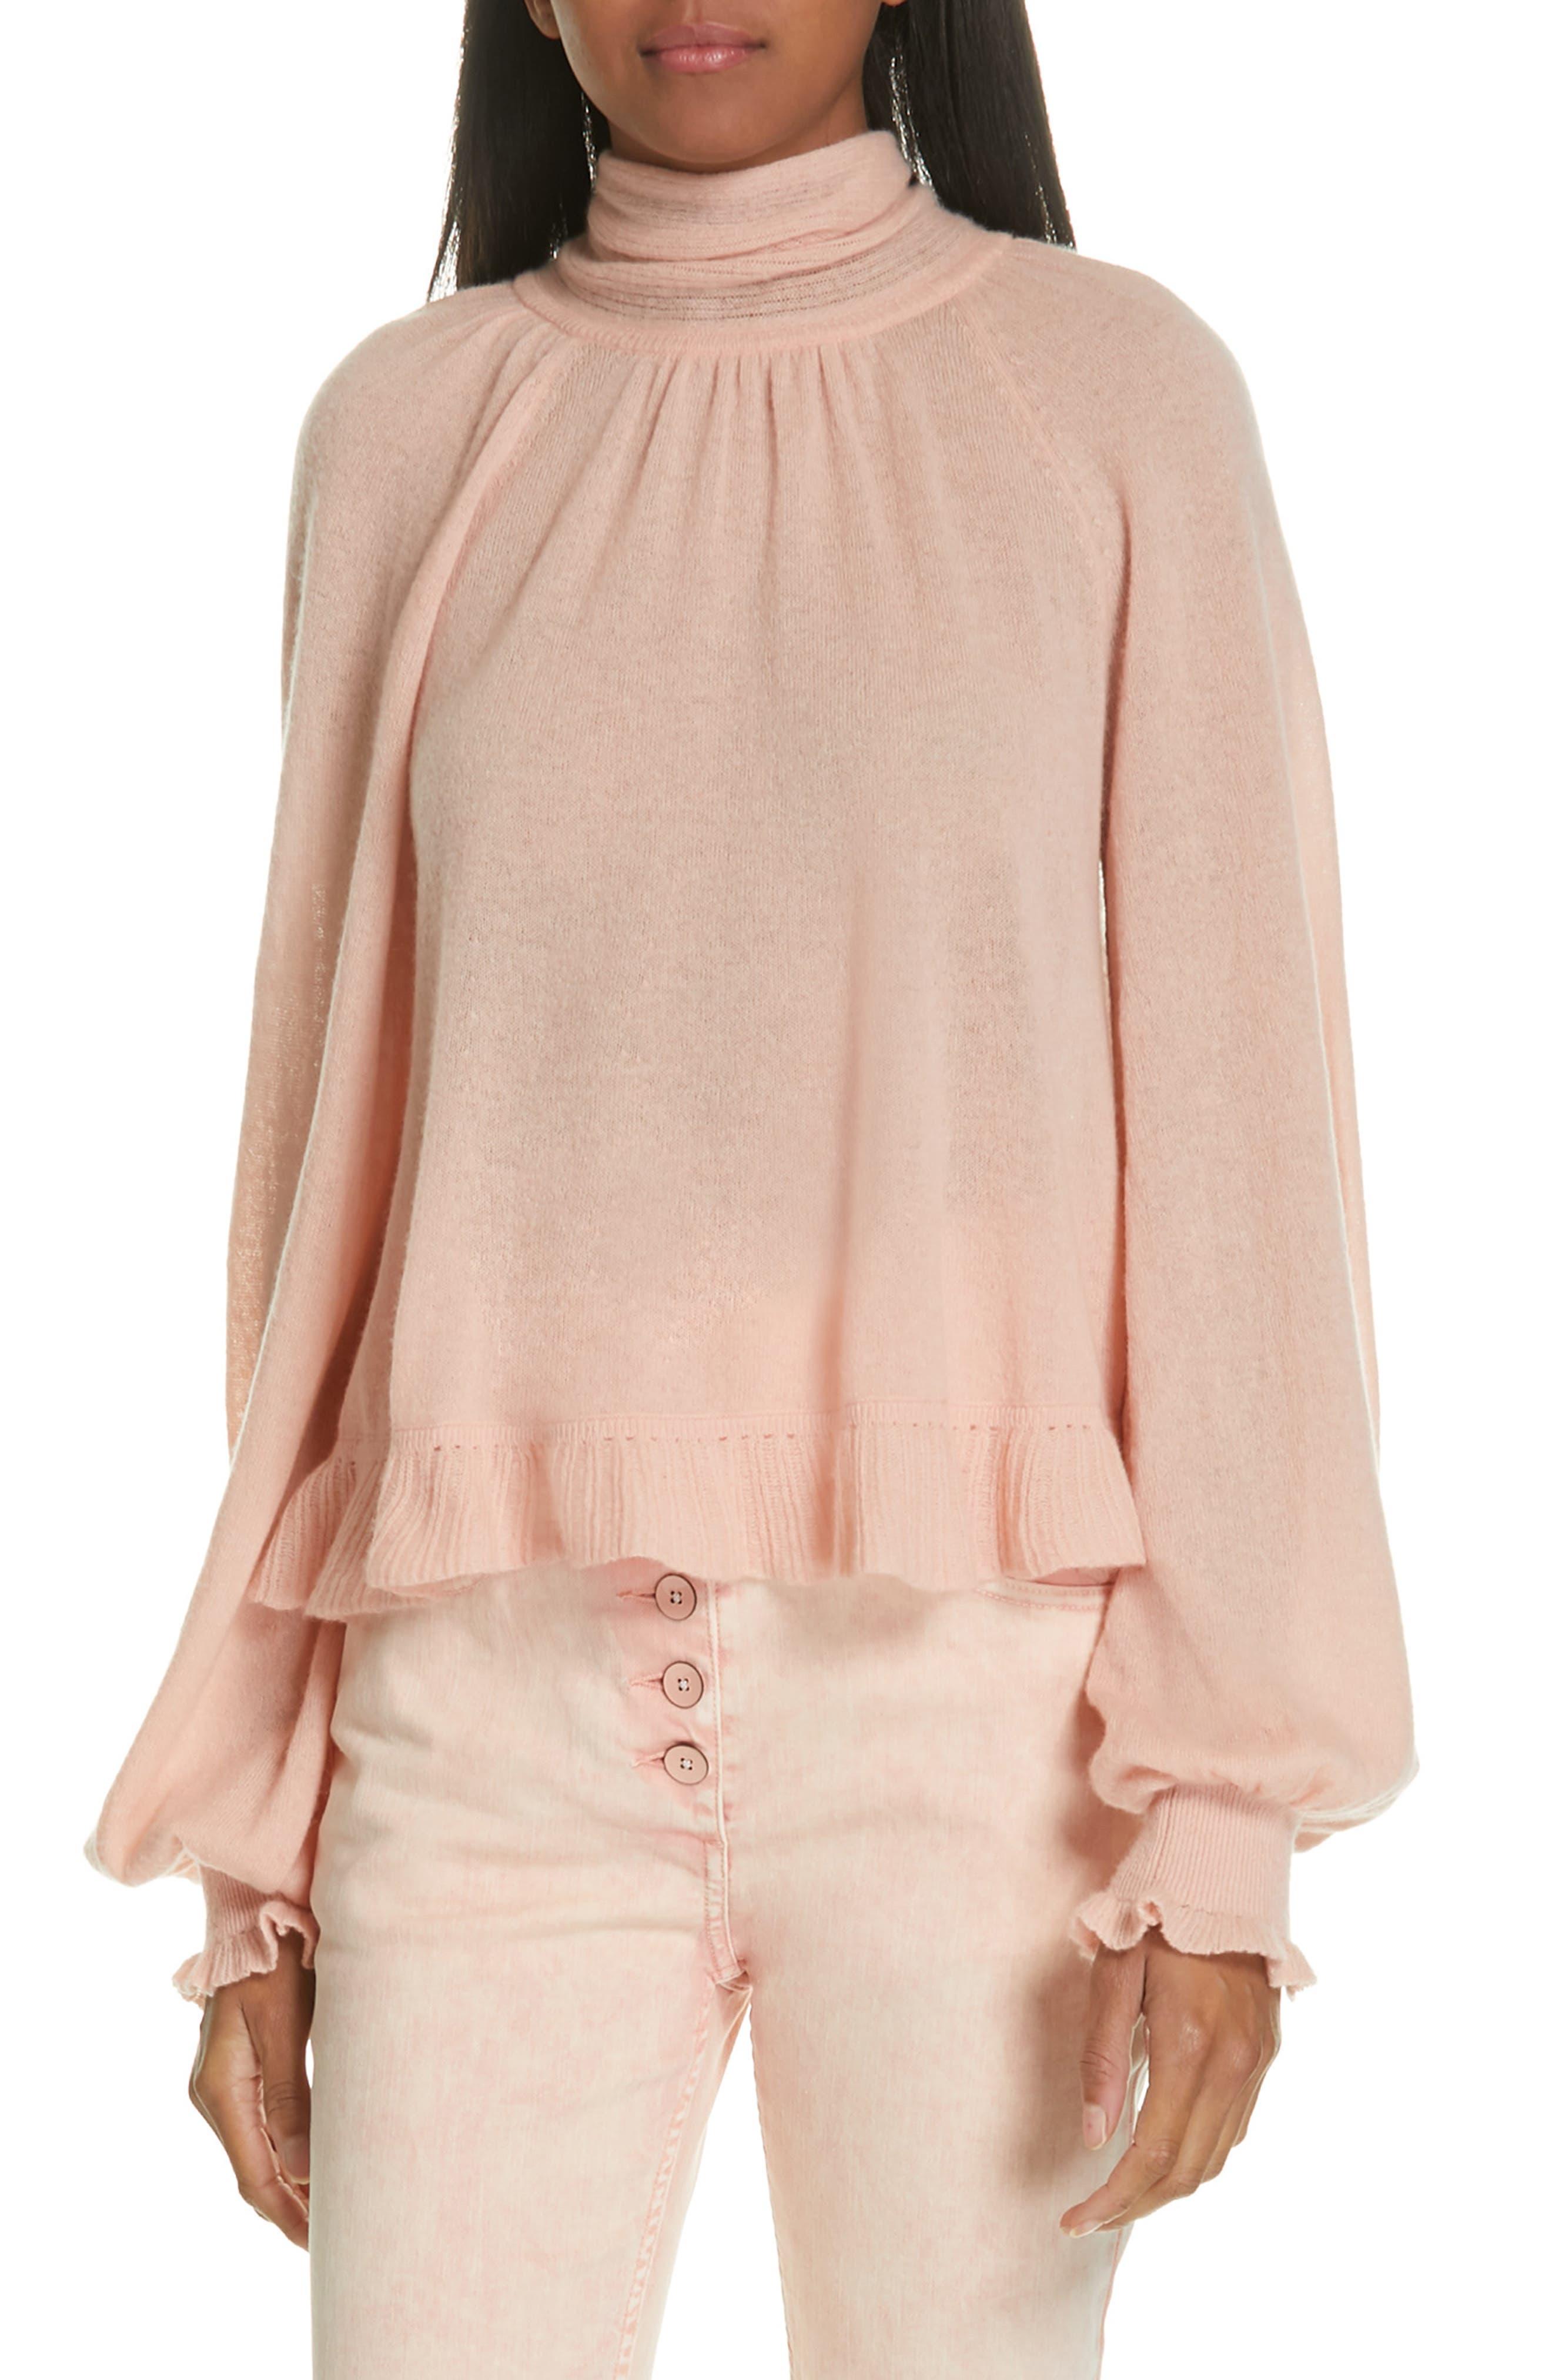 Clover Tie Back Cashmere Blend Sweater,                             Main thumbnail 1, color,                             ROSE